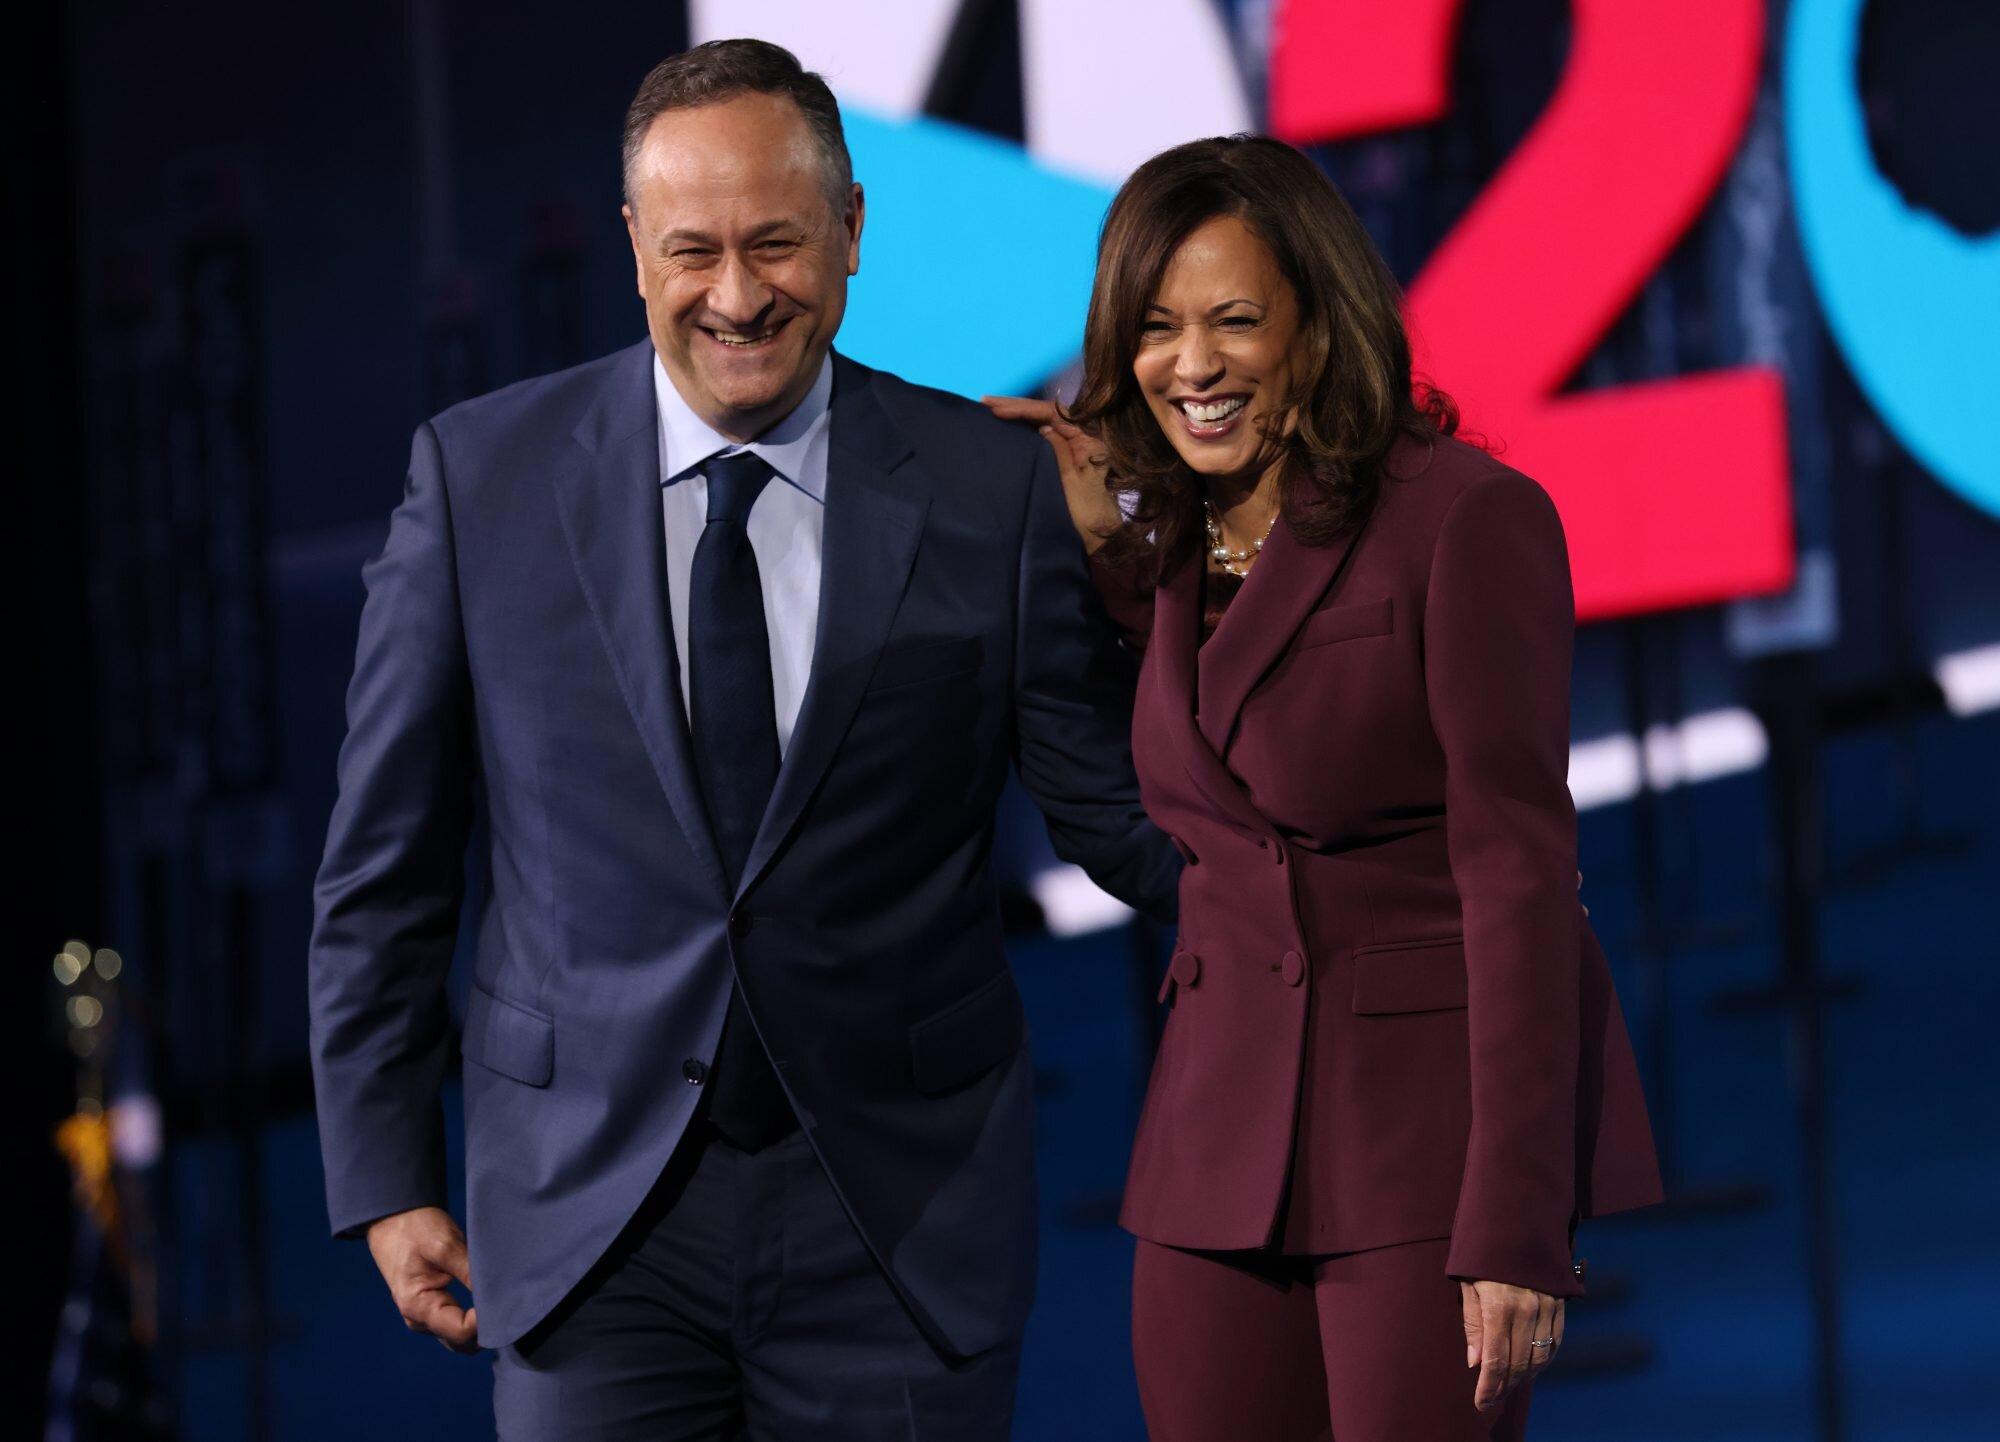 vicepresidenta Kamala Harris y su esposo Doug Emhoff